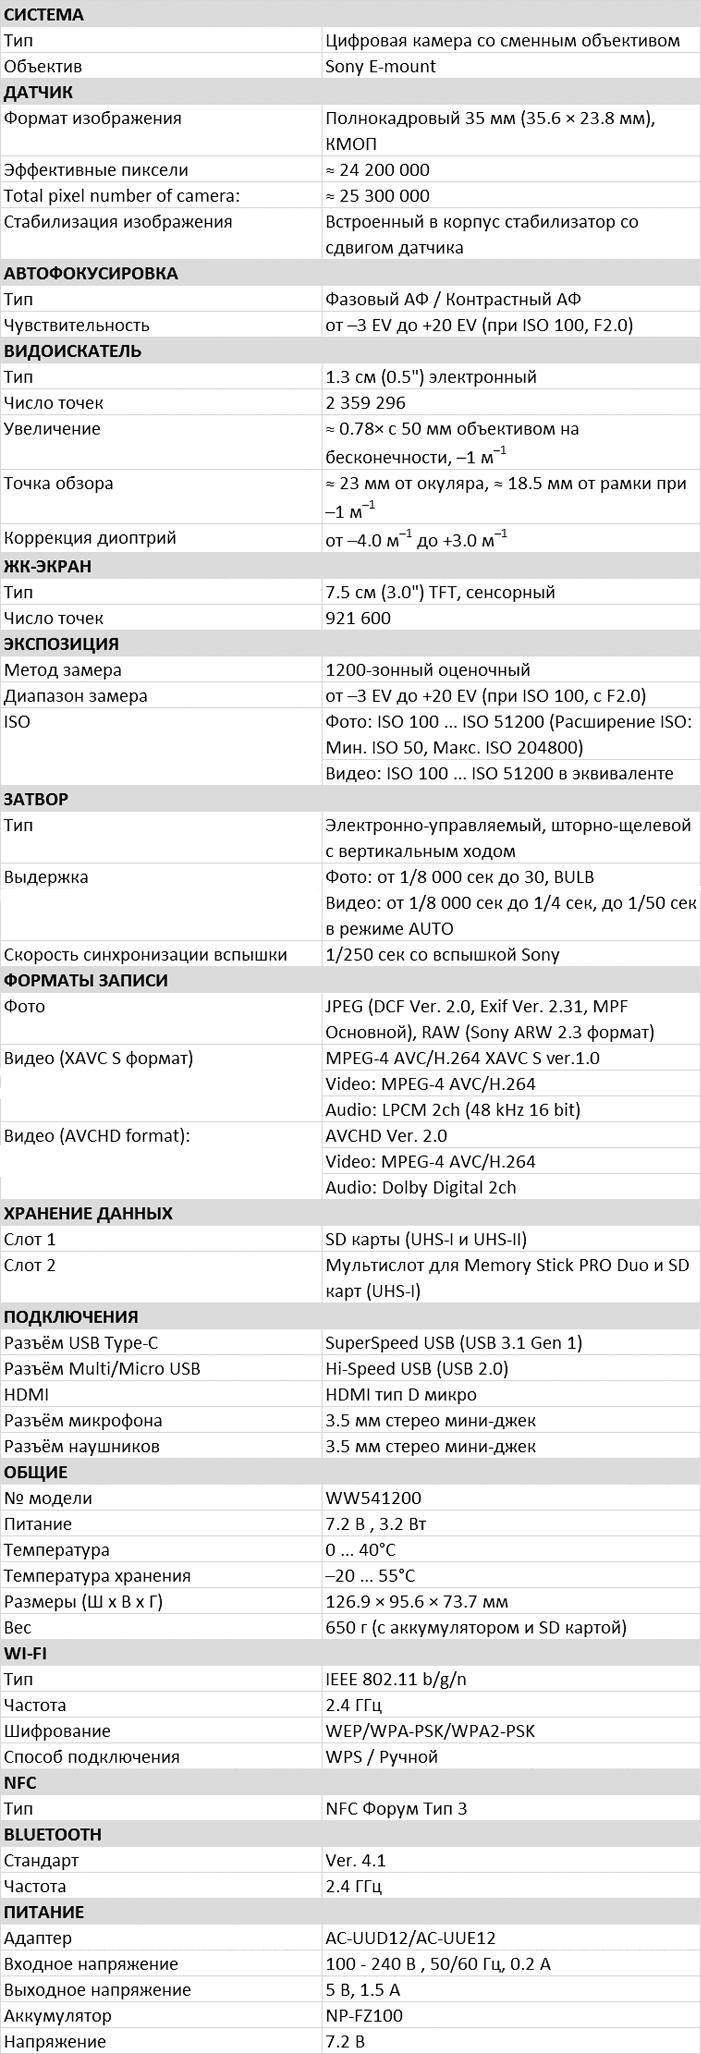 Характеристики Sony A7 3